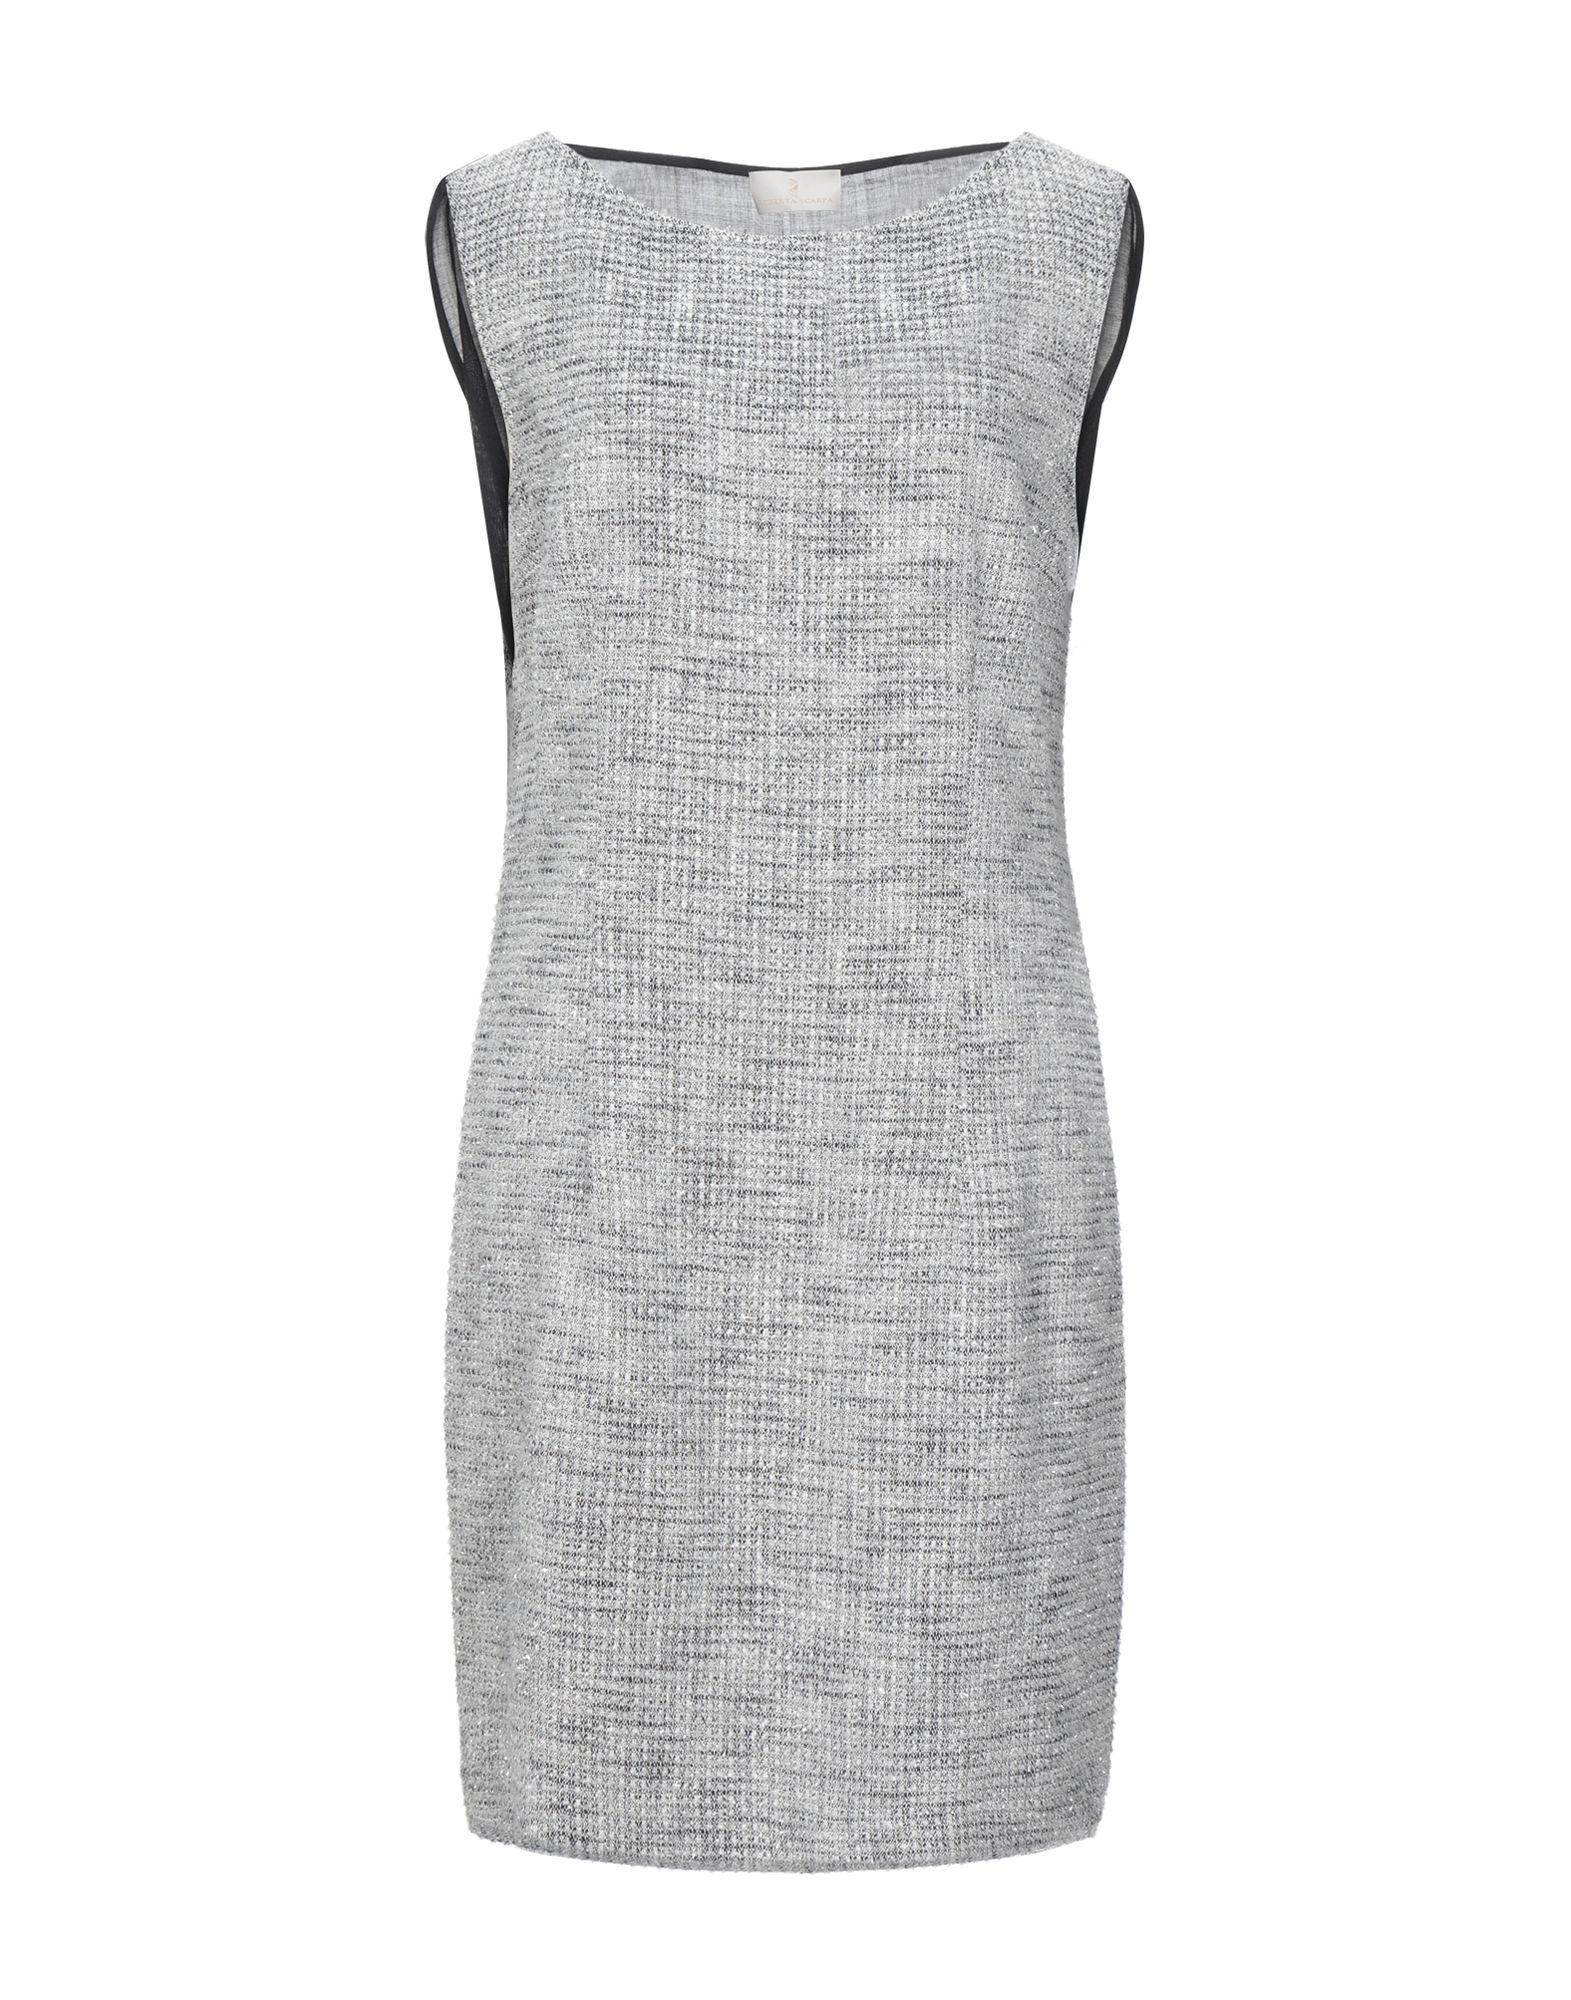 ROBERTA SCARPA Короткое платье roberta scarpa длинное платье